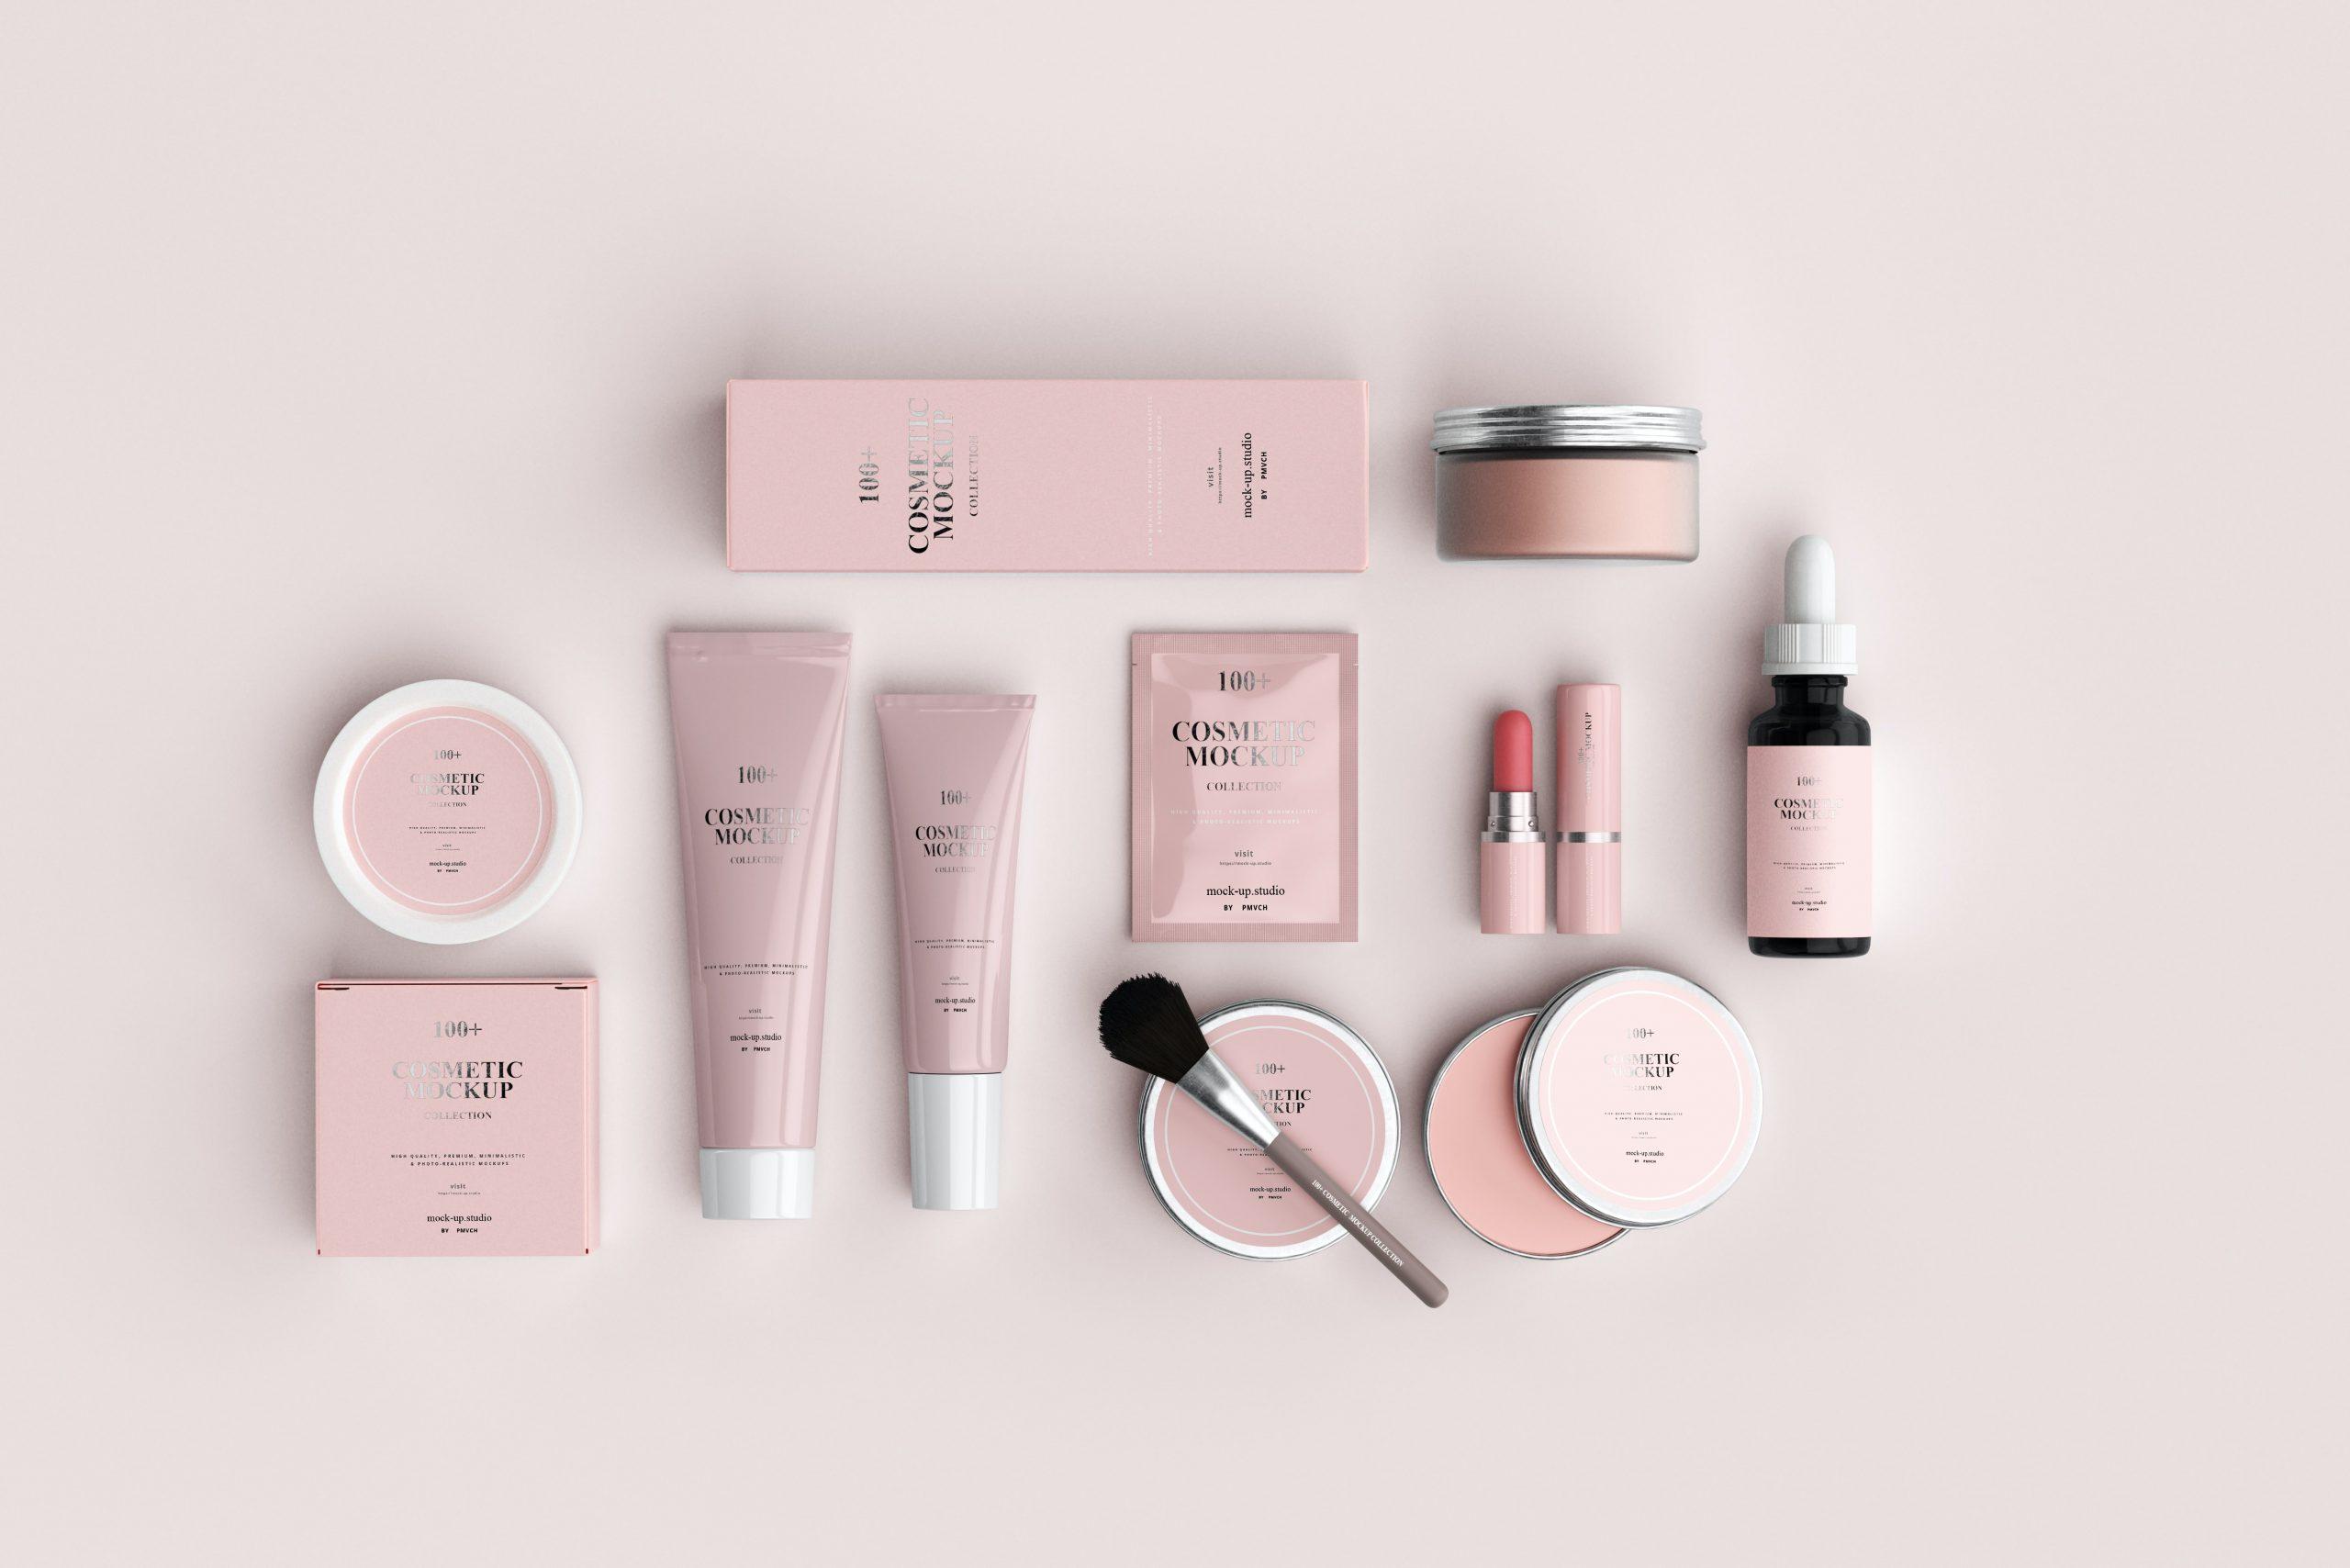 cosmetica10__化粧品10